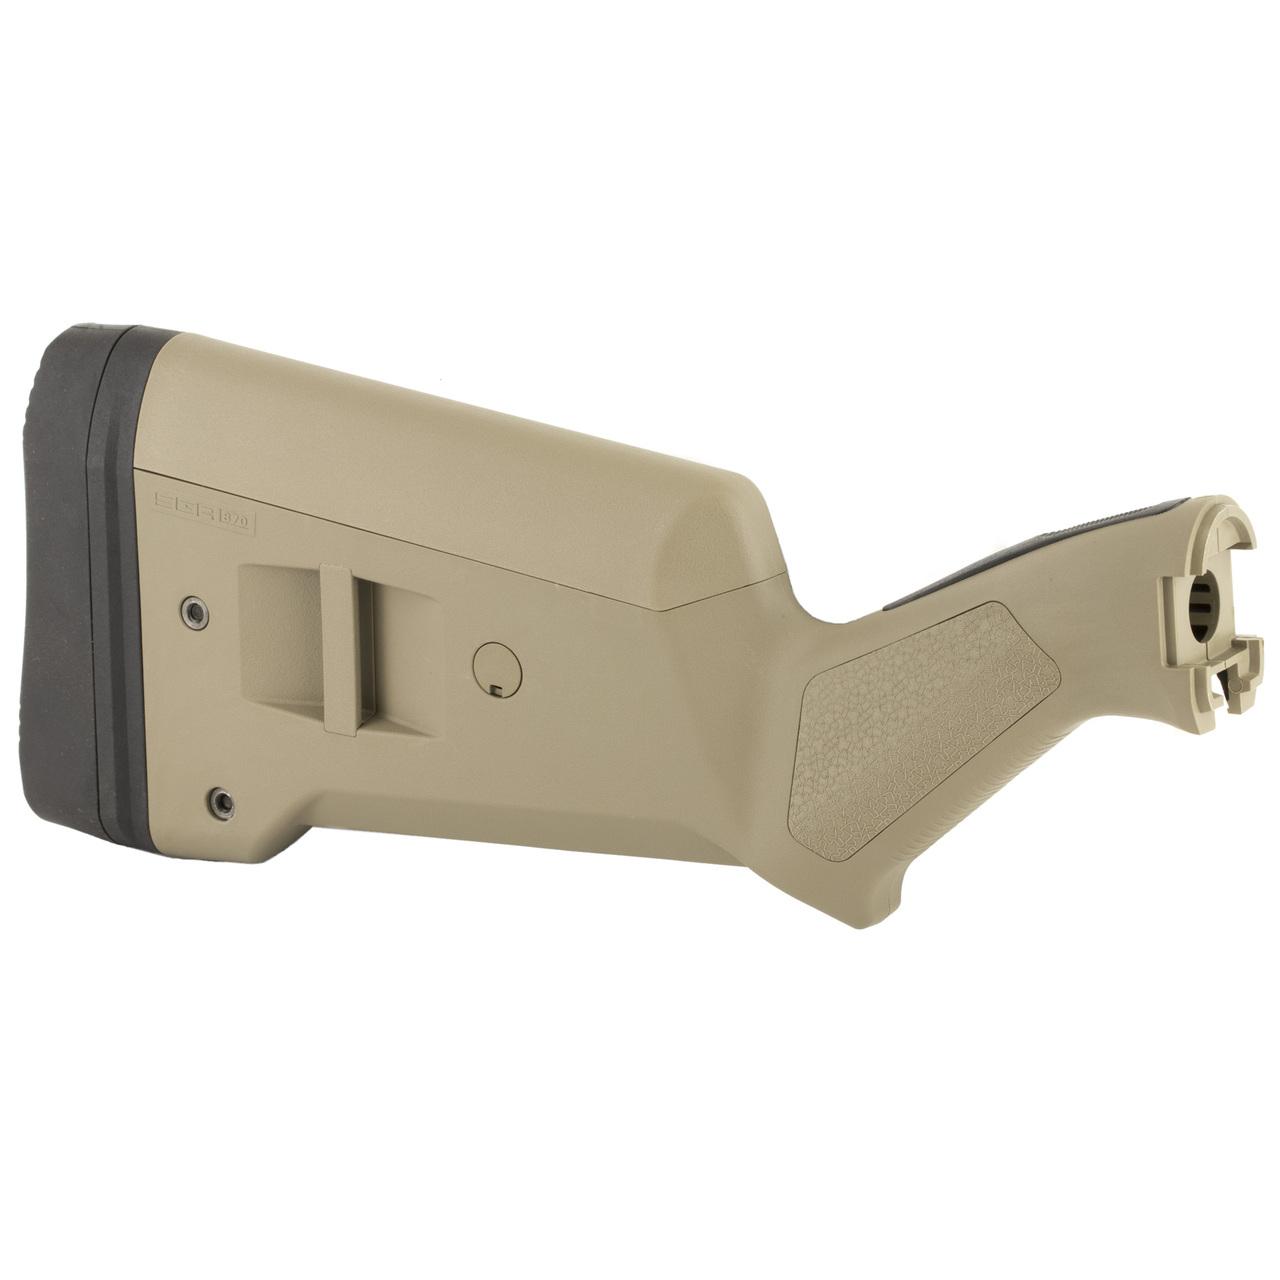 Magpul SGA Stock Remington 870 FDE